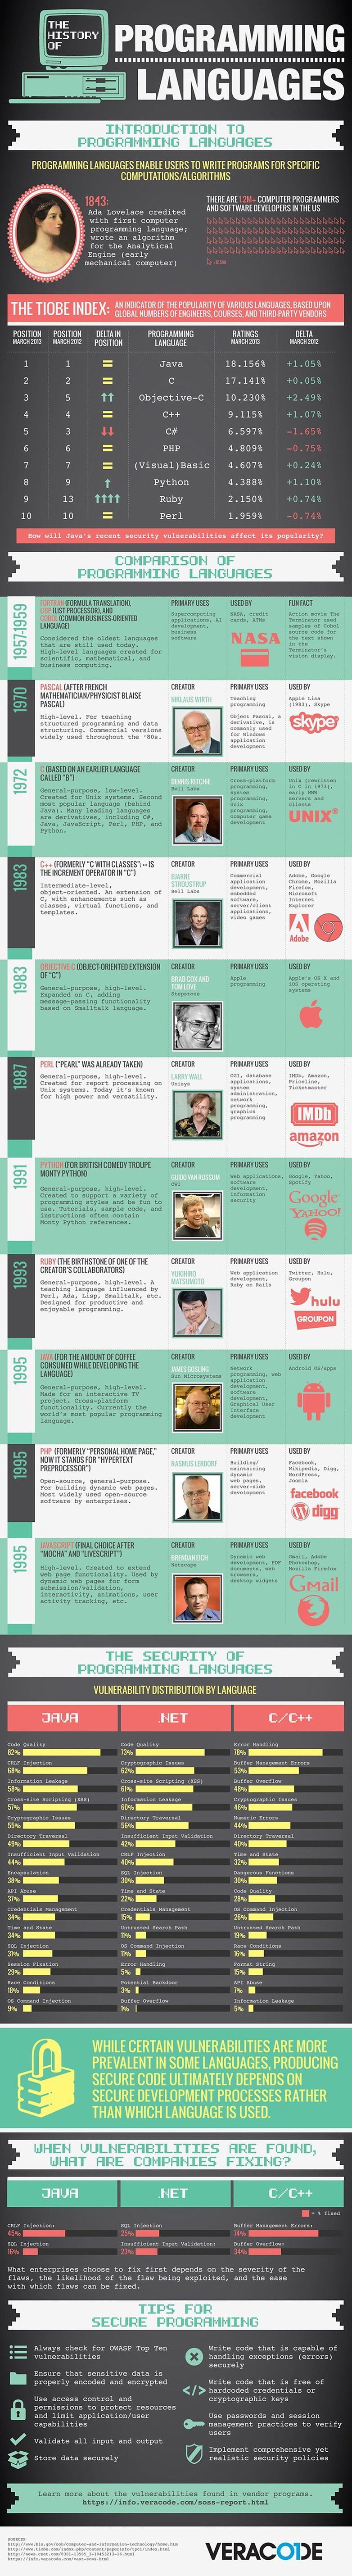 programminginfographic